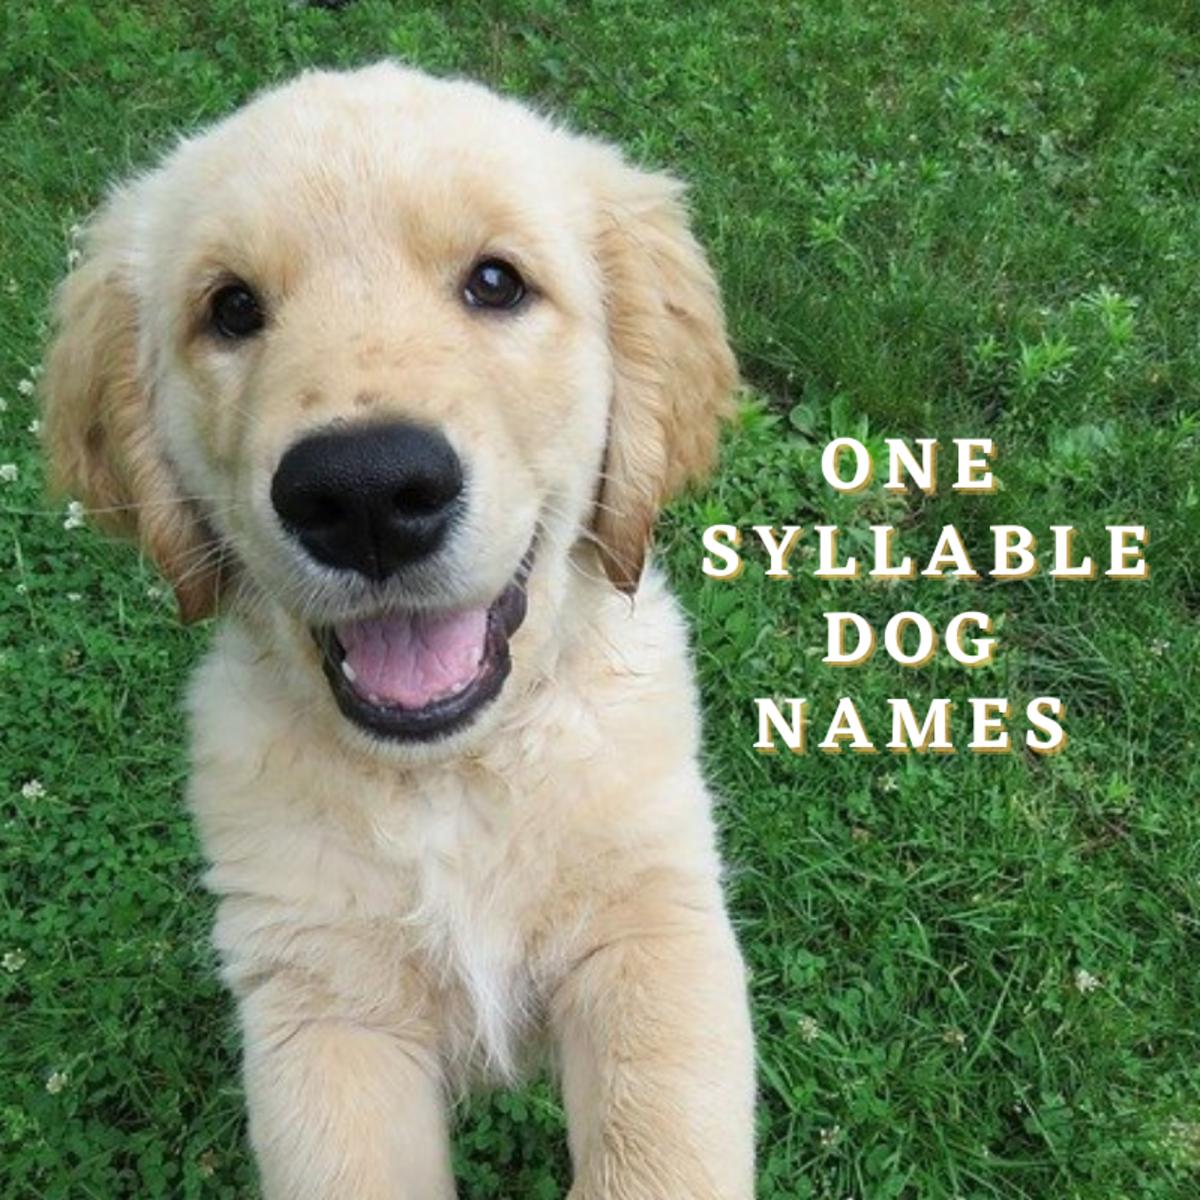 One Syllable Dog Names